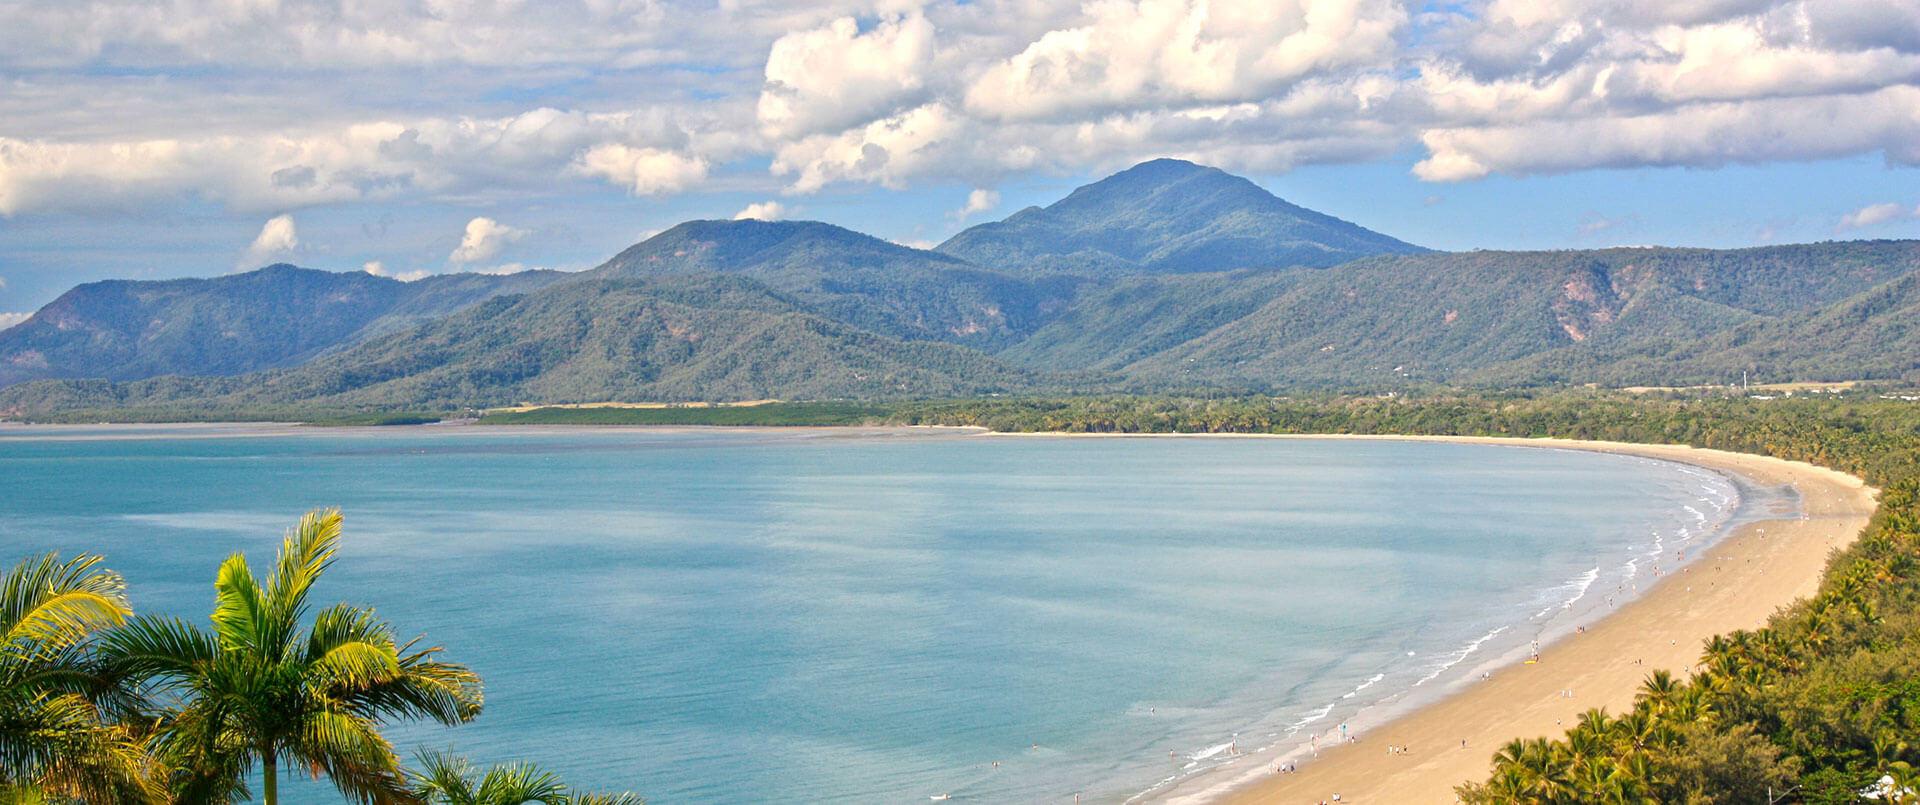 8 Day Port Douglas, Rainforest & Reef Experience